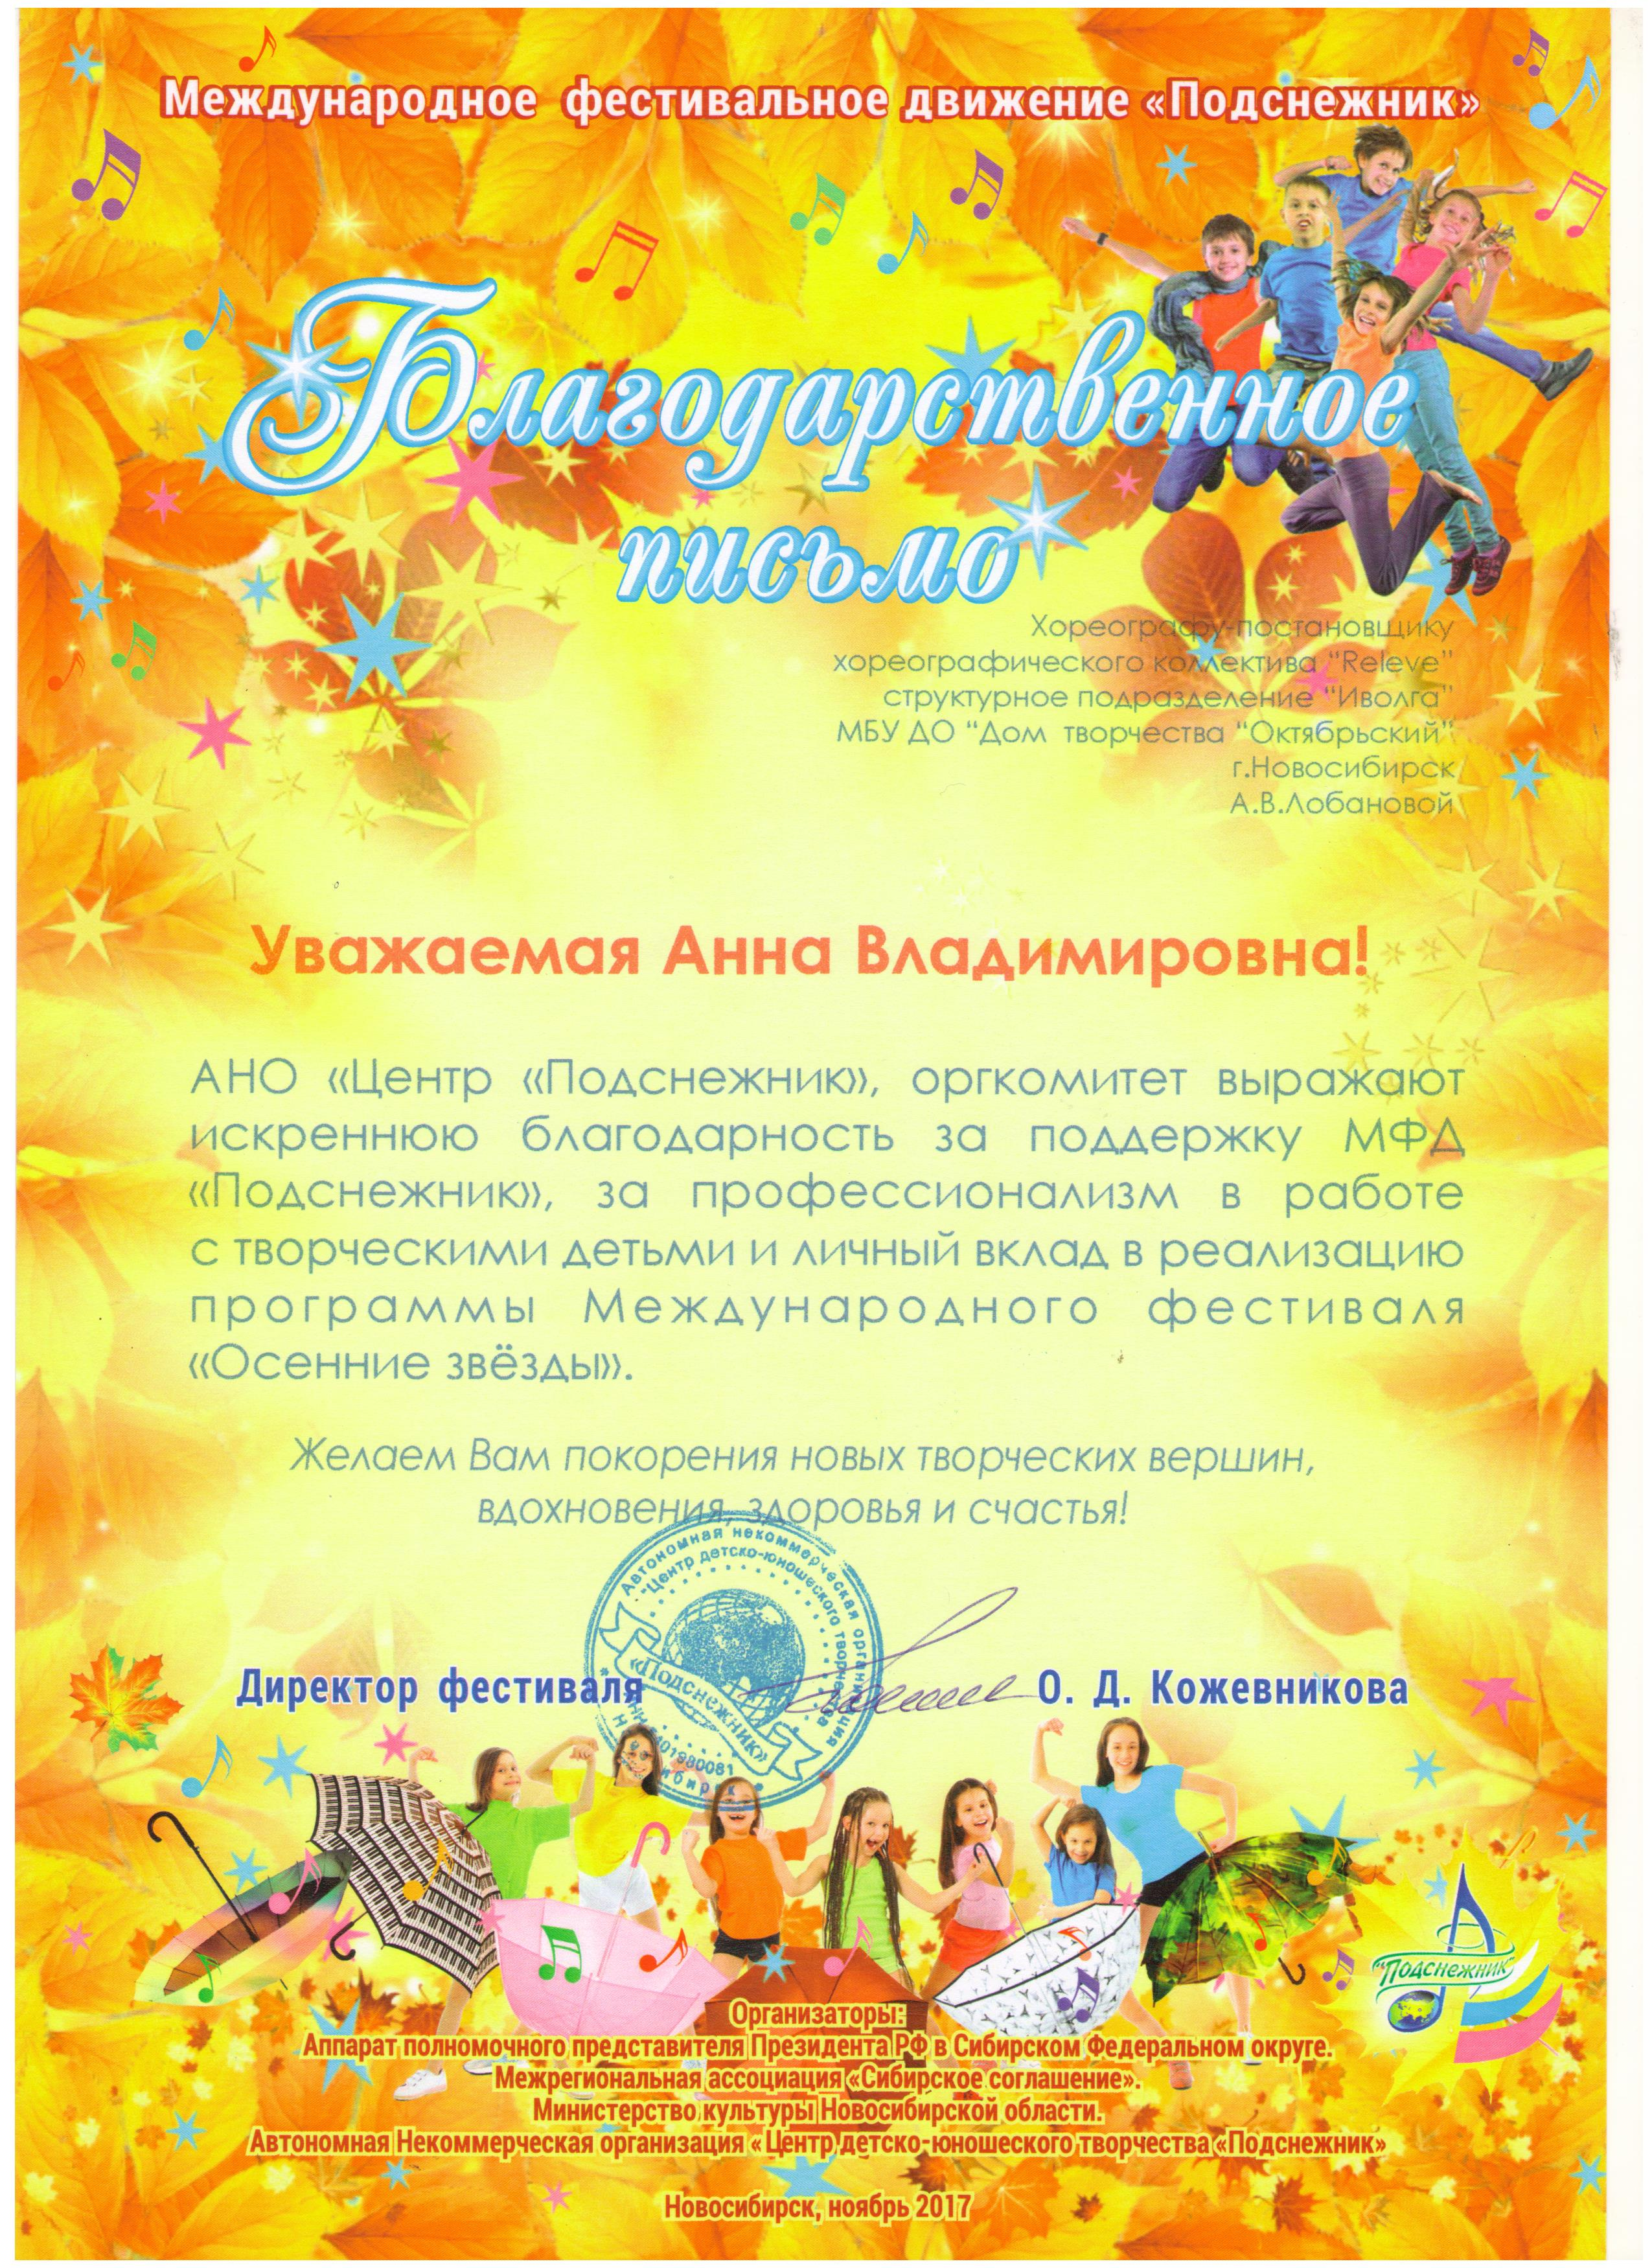 Blagodarnost_Lobanova_05.11.17-001